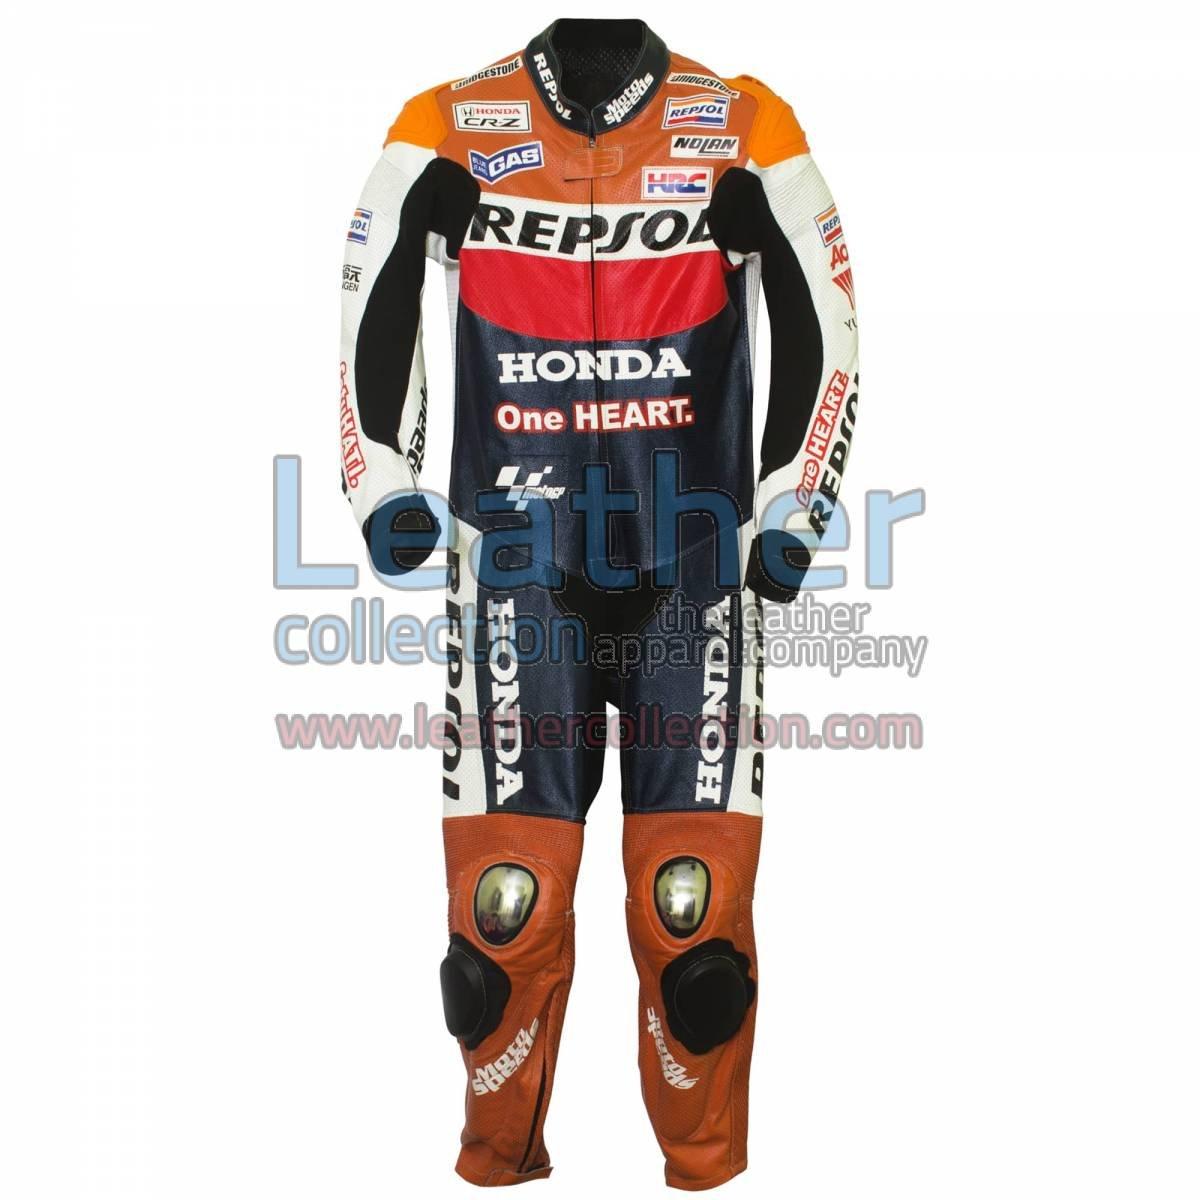 Dani Pedrosa 2012 Honda Repsol One Heart Race Suit